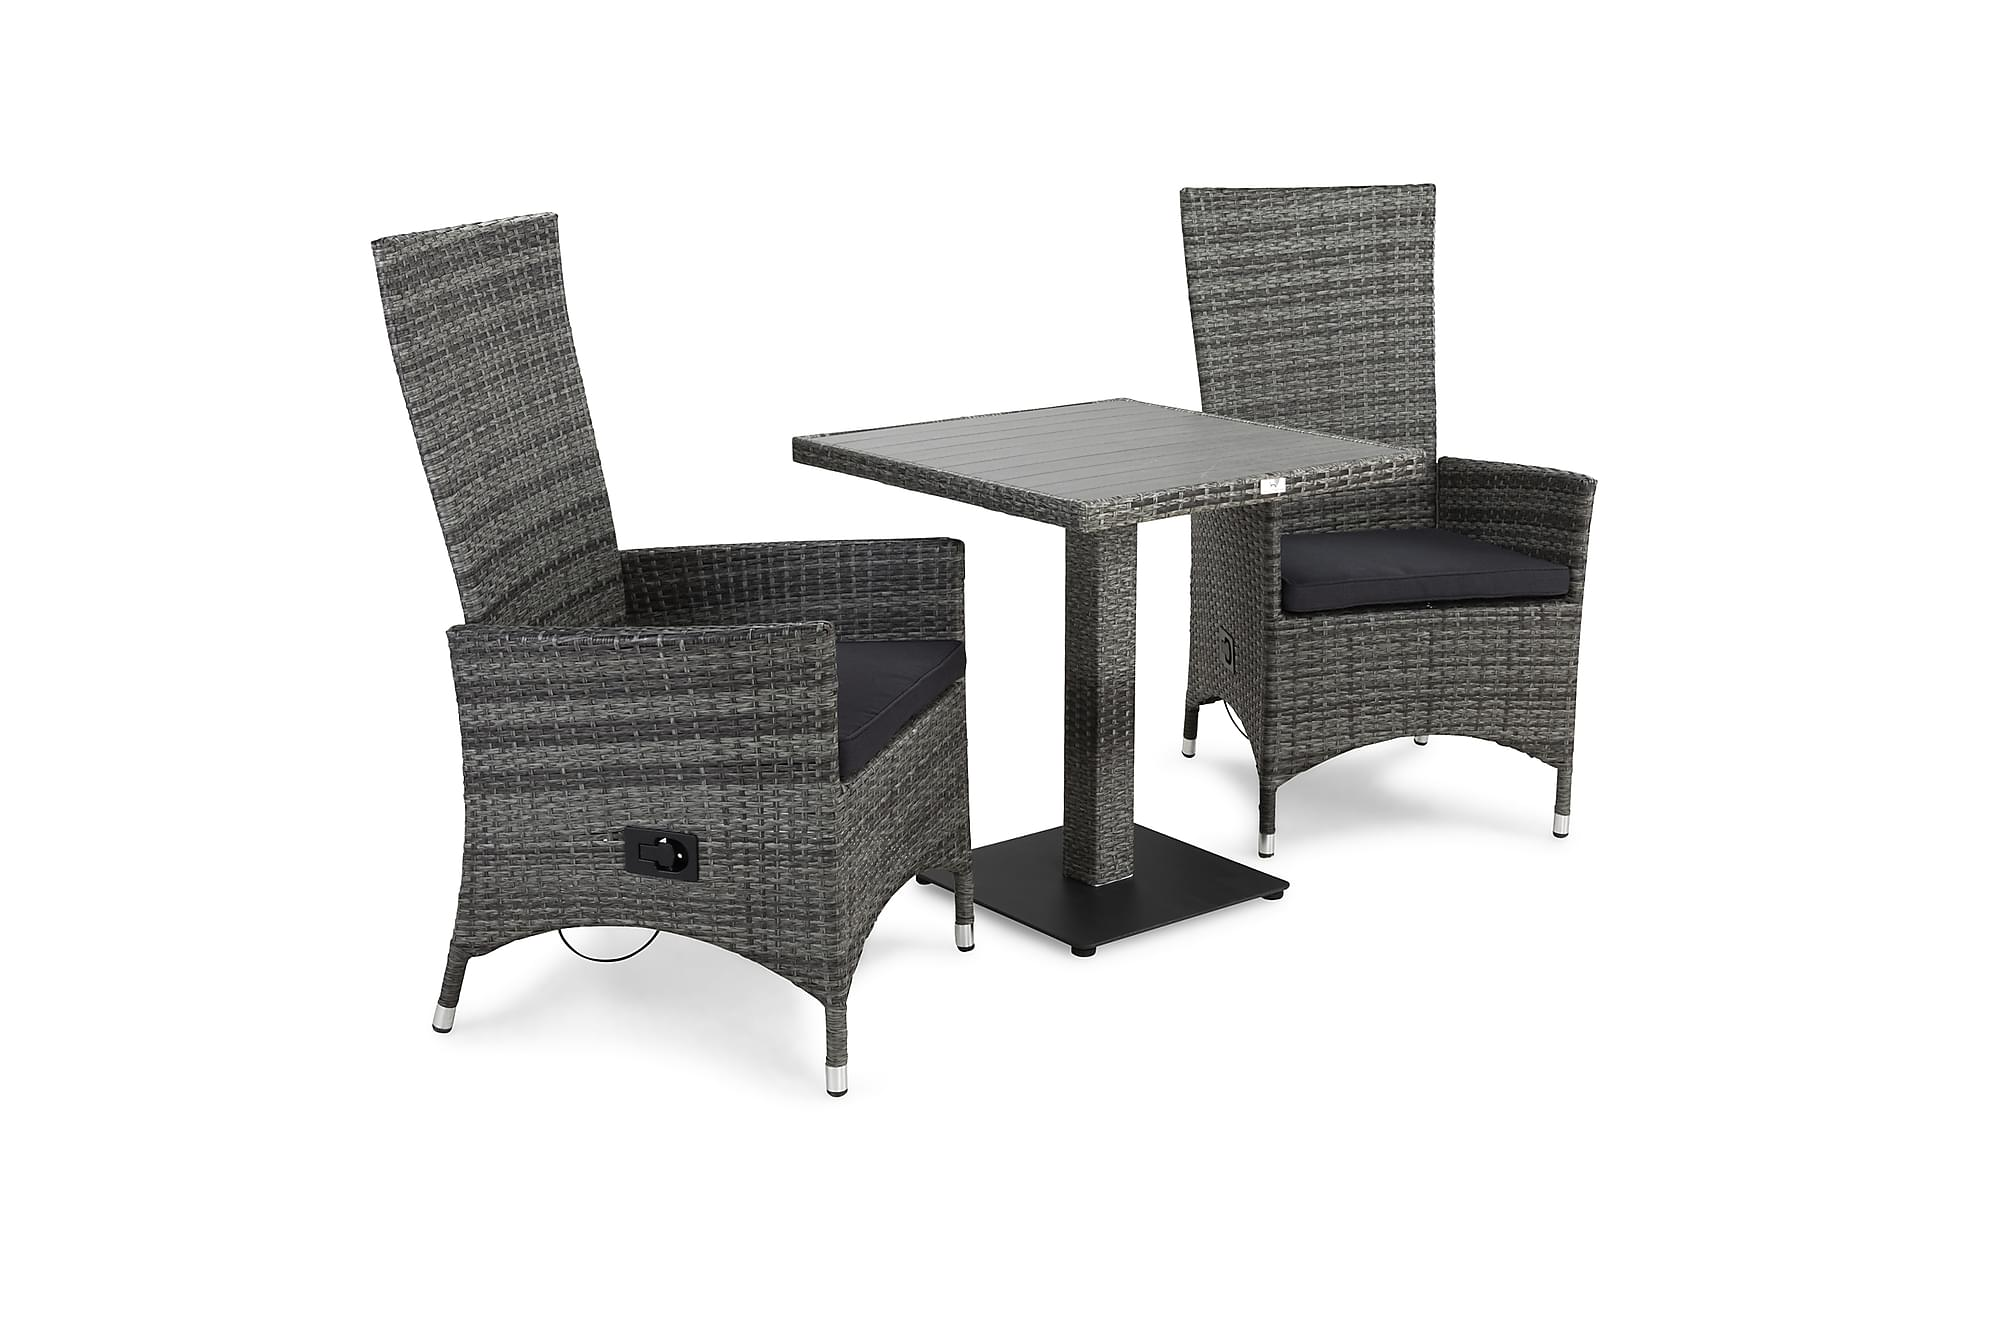 BAHAMAS Cafébord 70 + 2 JENNY Fåtölj Grå + Dyna Grå